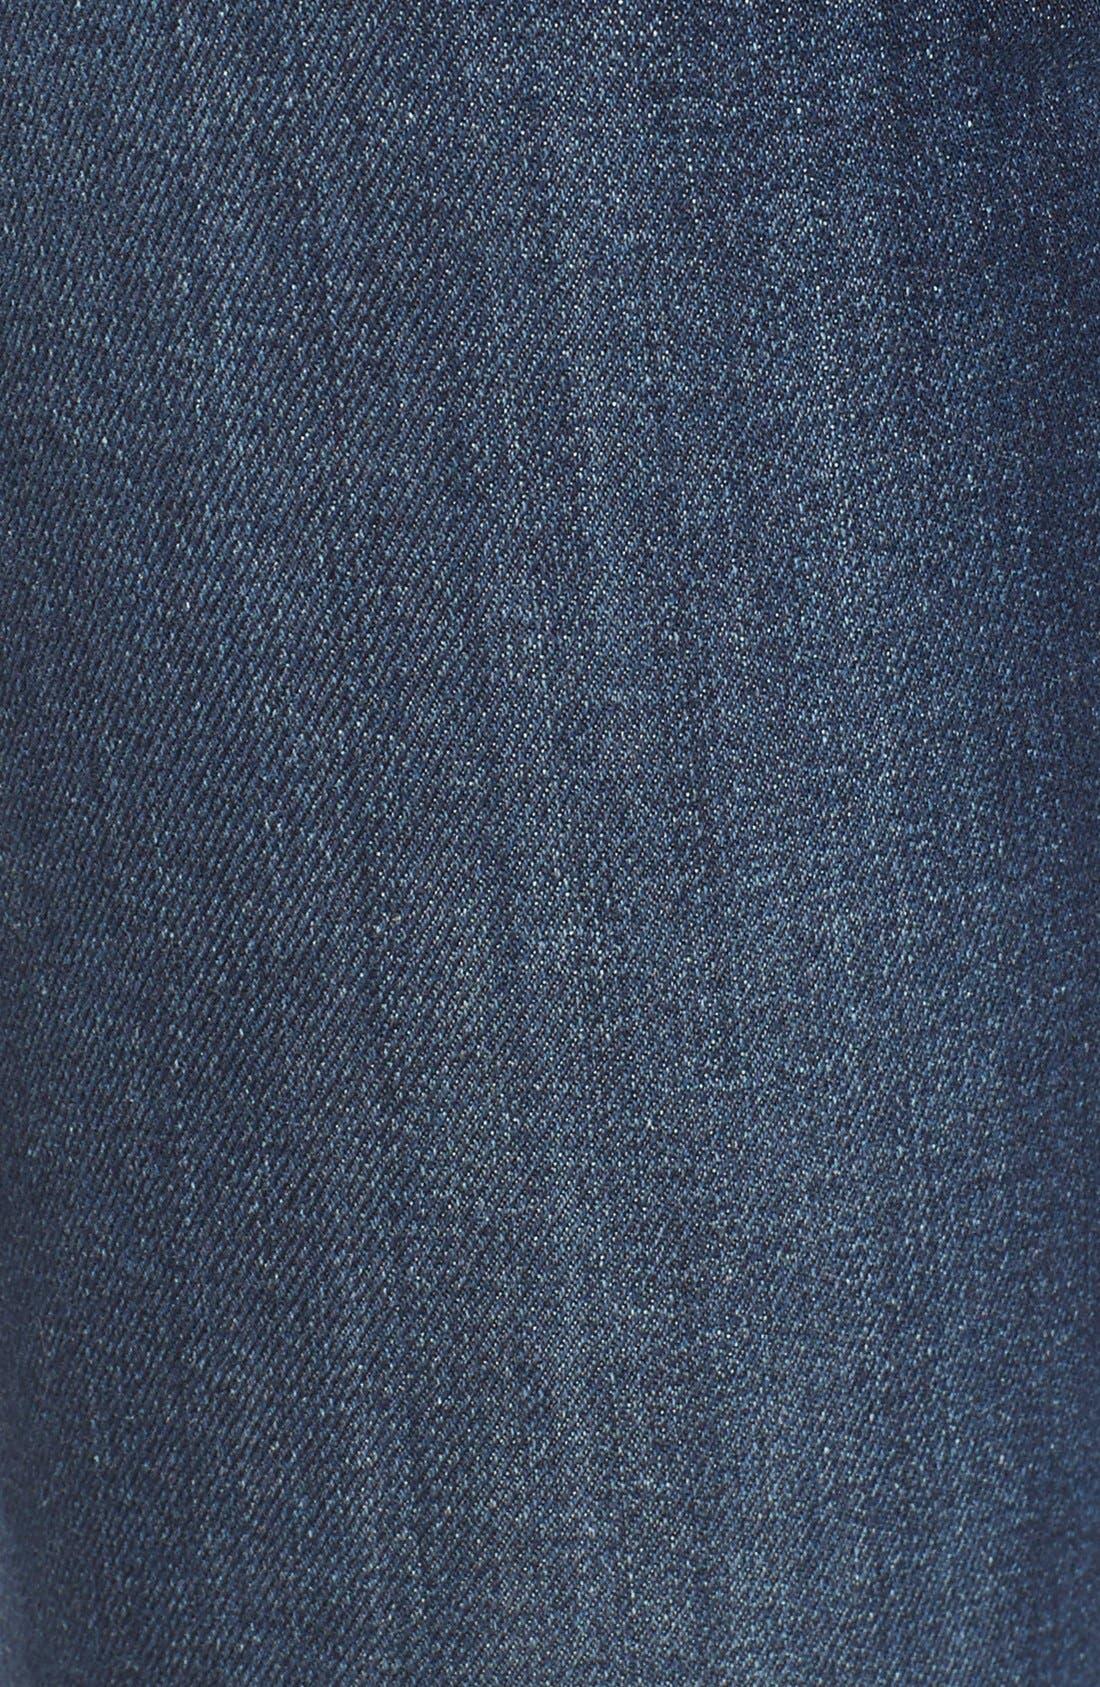 Alternate Image 5  - J Brand 'Maria' Skinny Jeans (Oblivion)